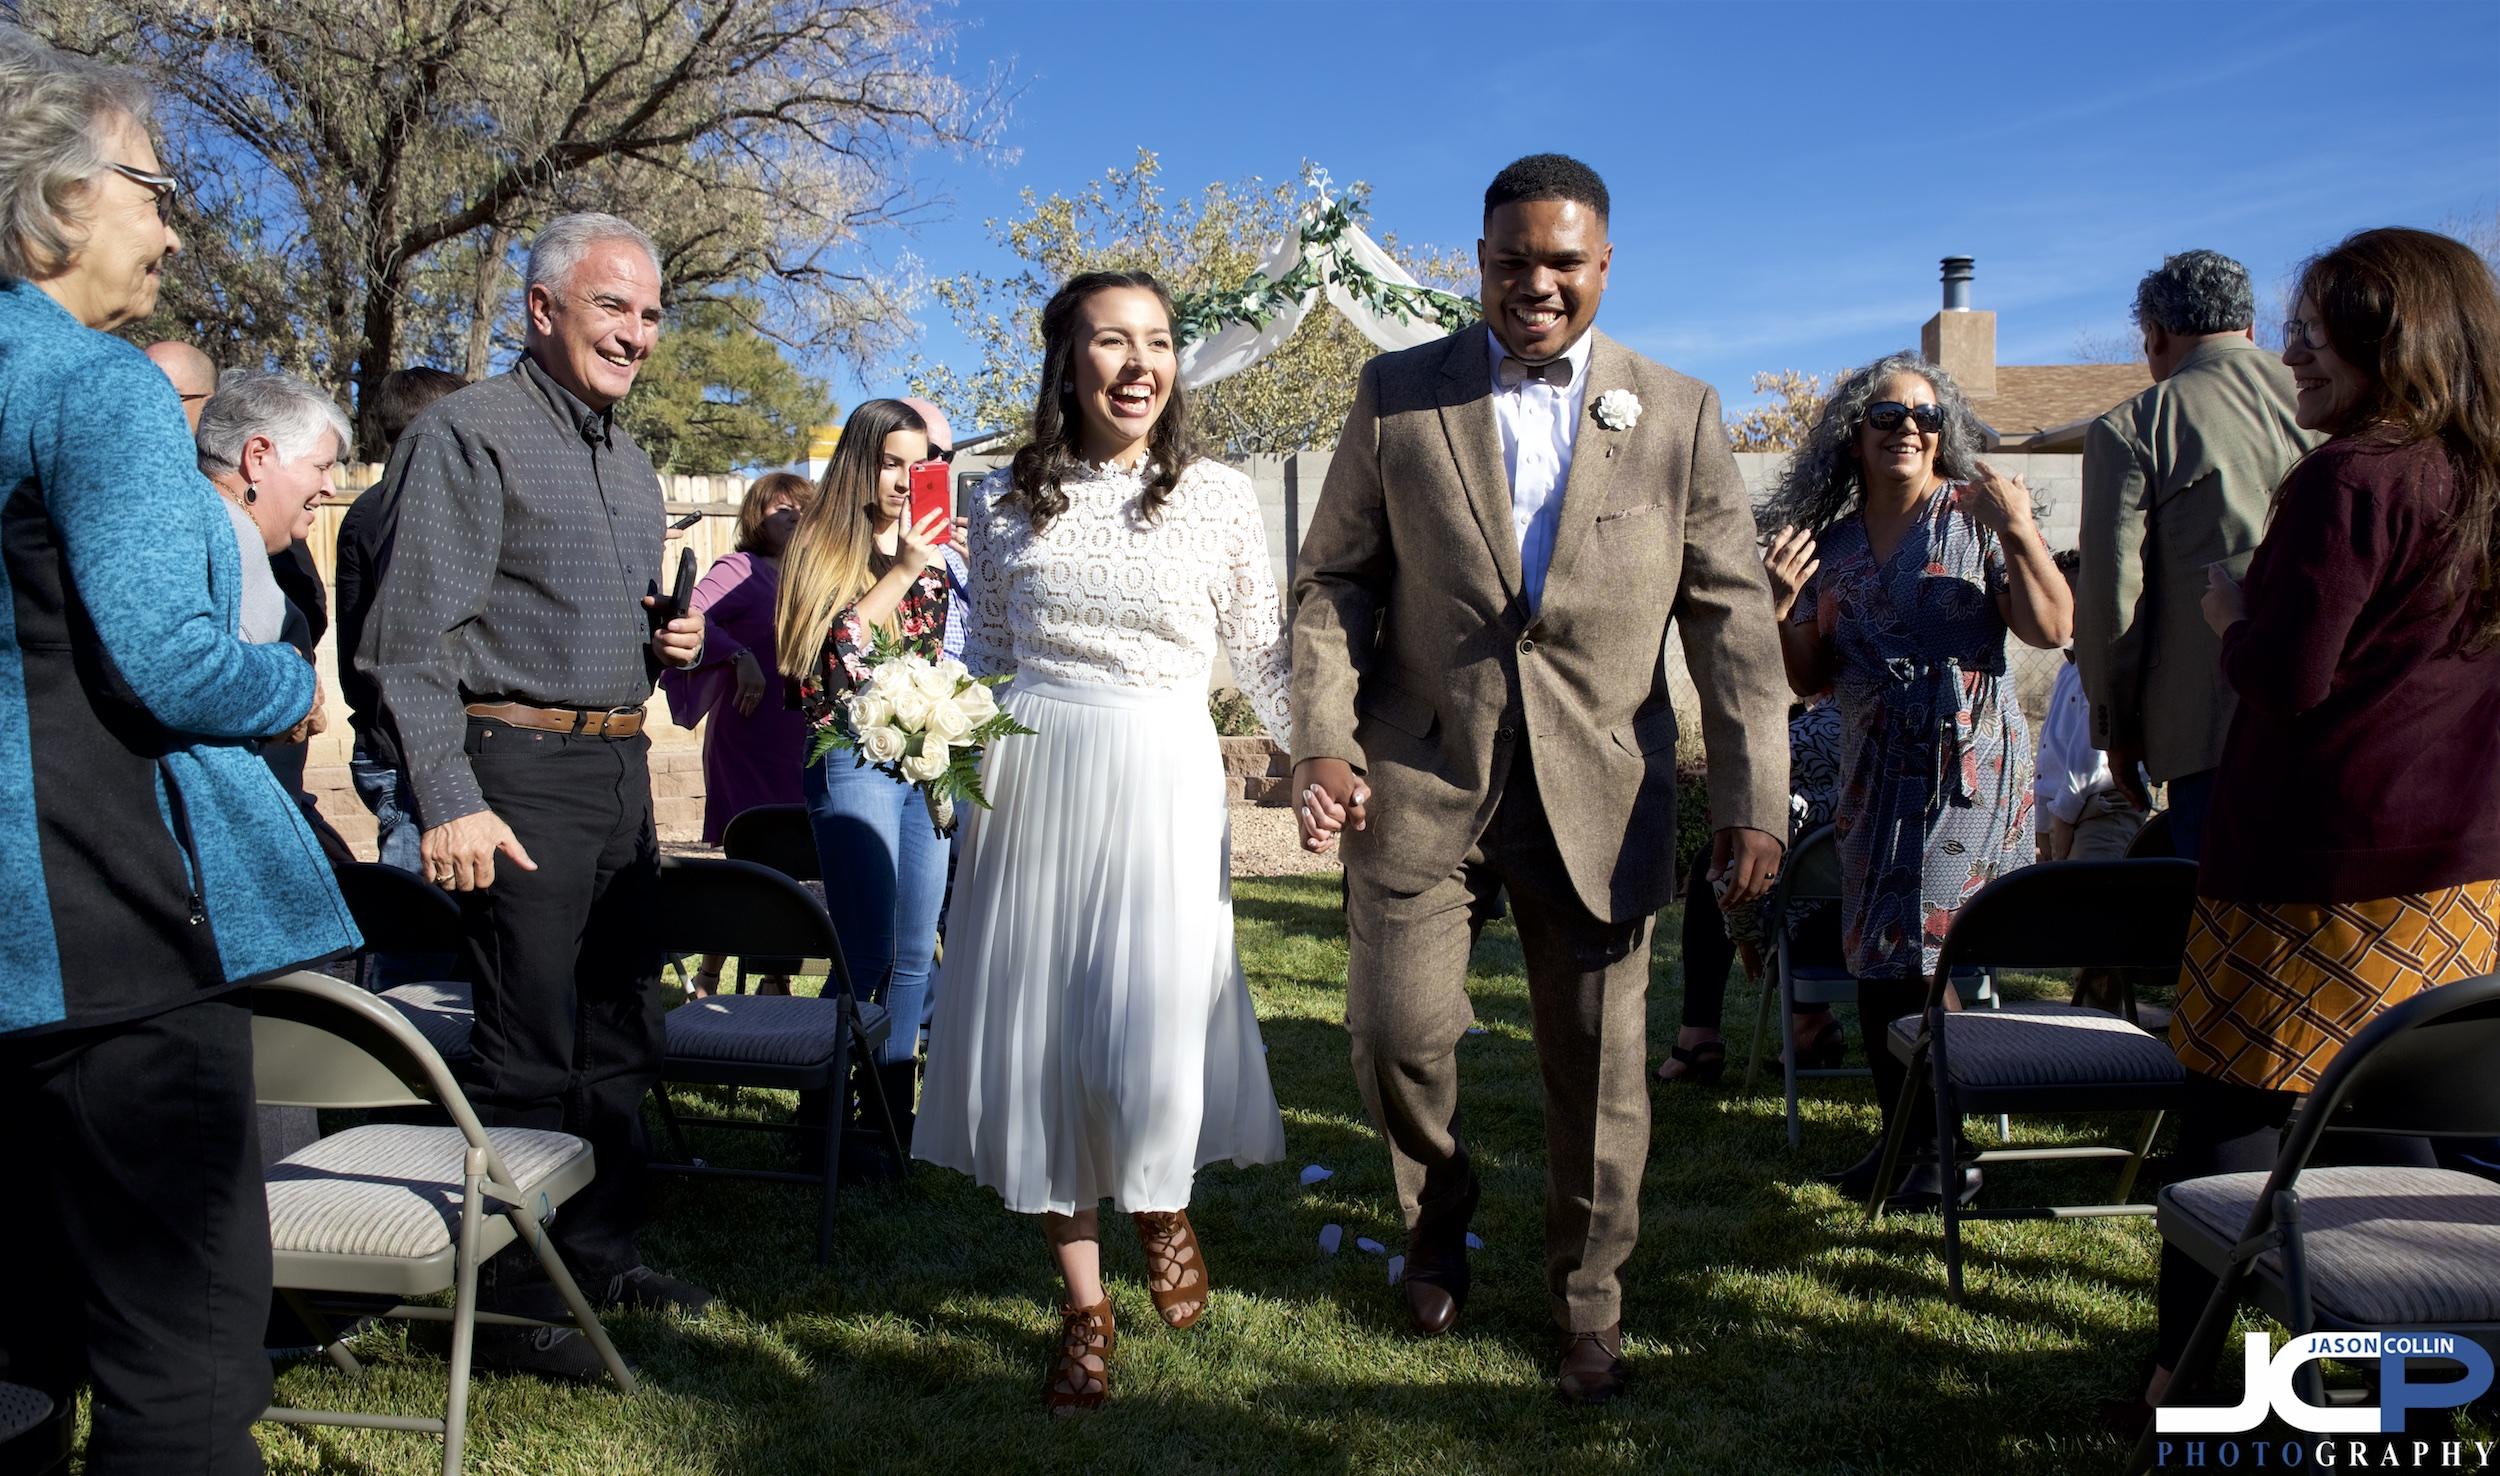 ac-11-17-2018-wedding-113336.jpg